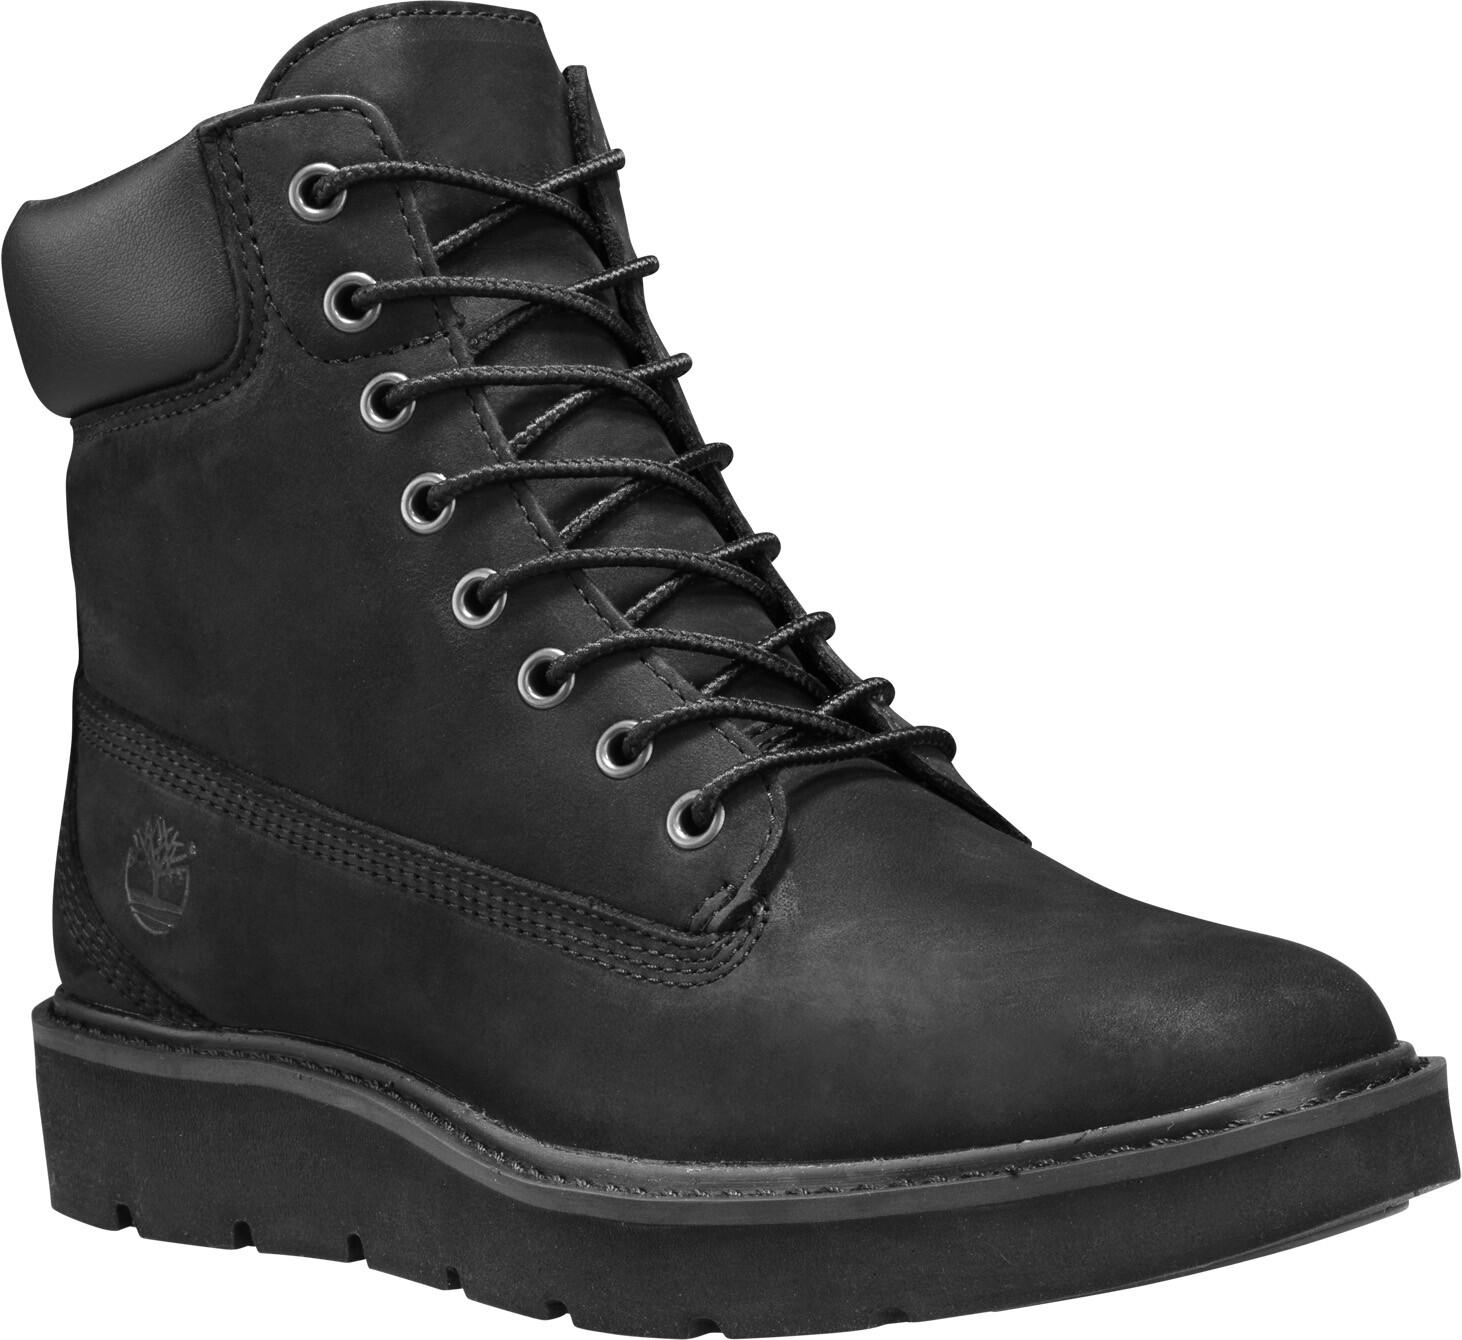 Timberland Kenniston Lace Up Boots 6 Damen Black Nubuck